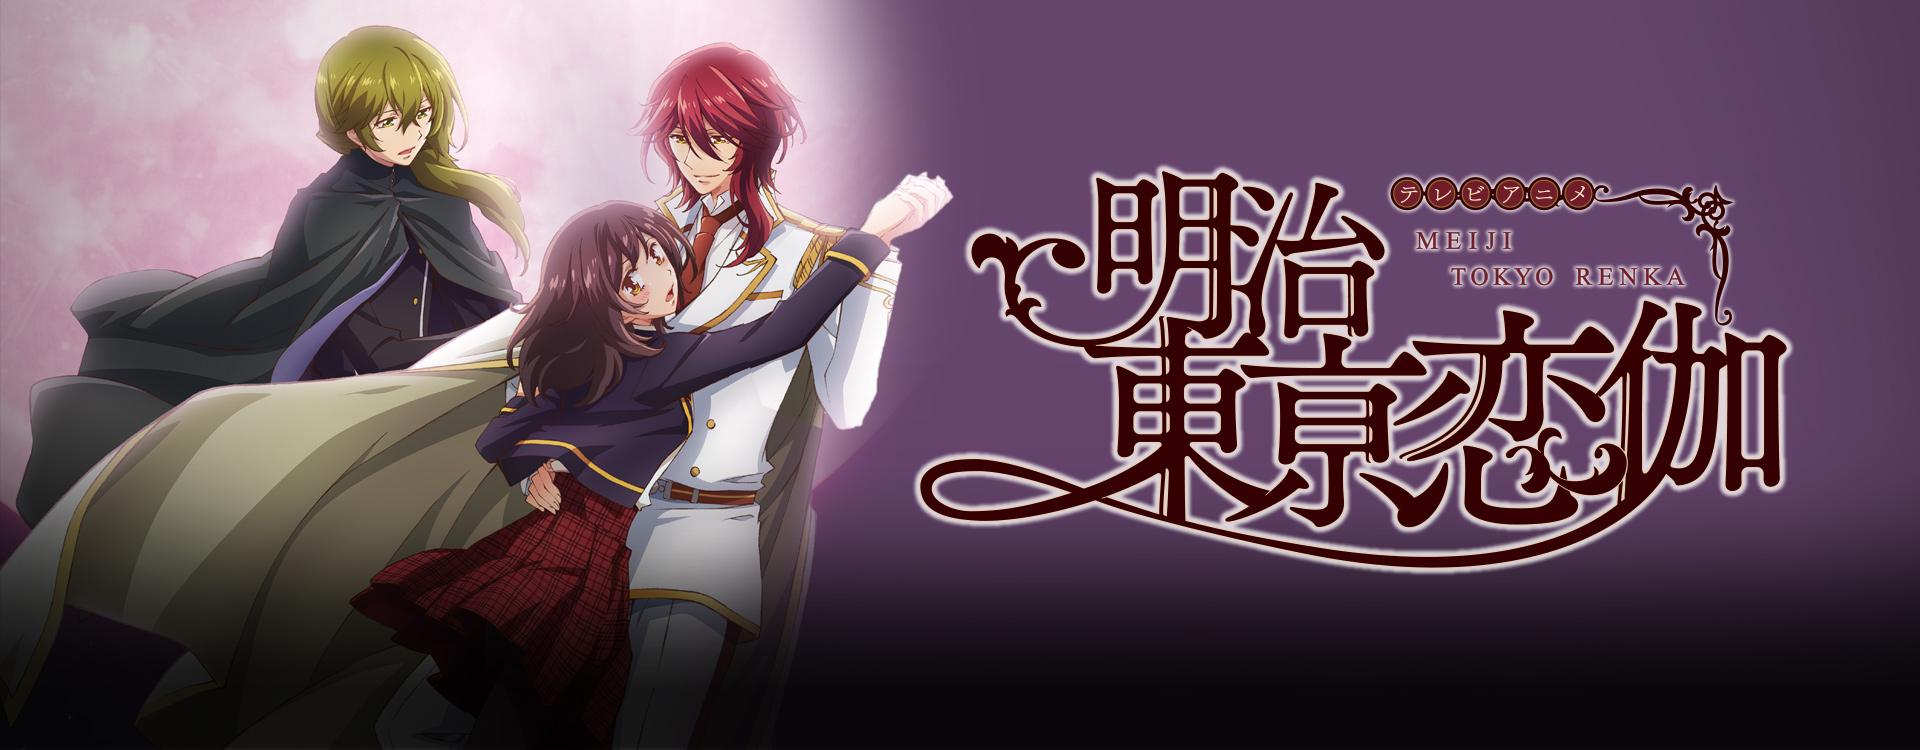 Watch Meiji Tokyo Renka Sub Dub Fantasy Romance Anime